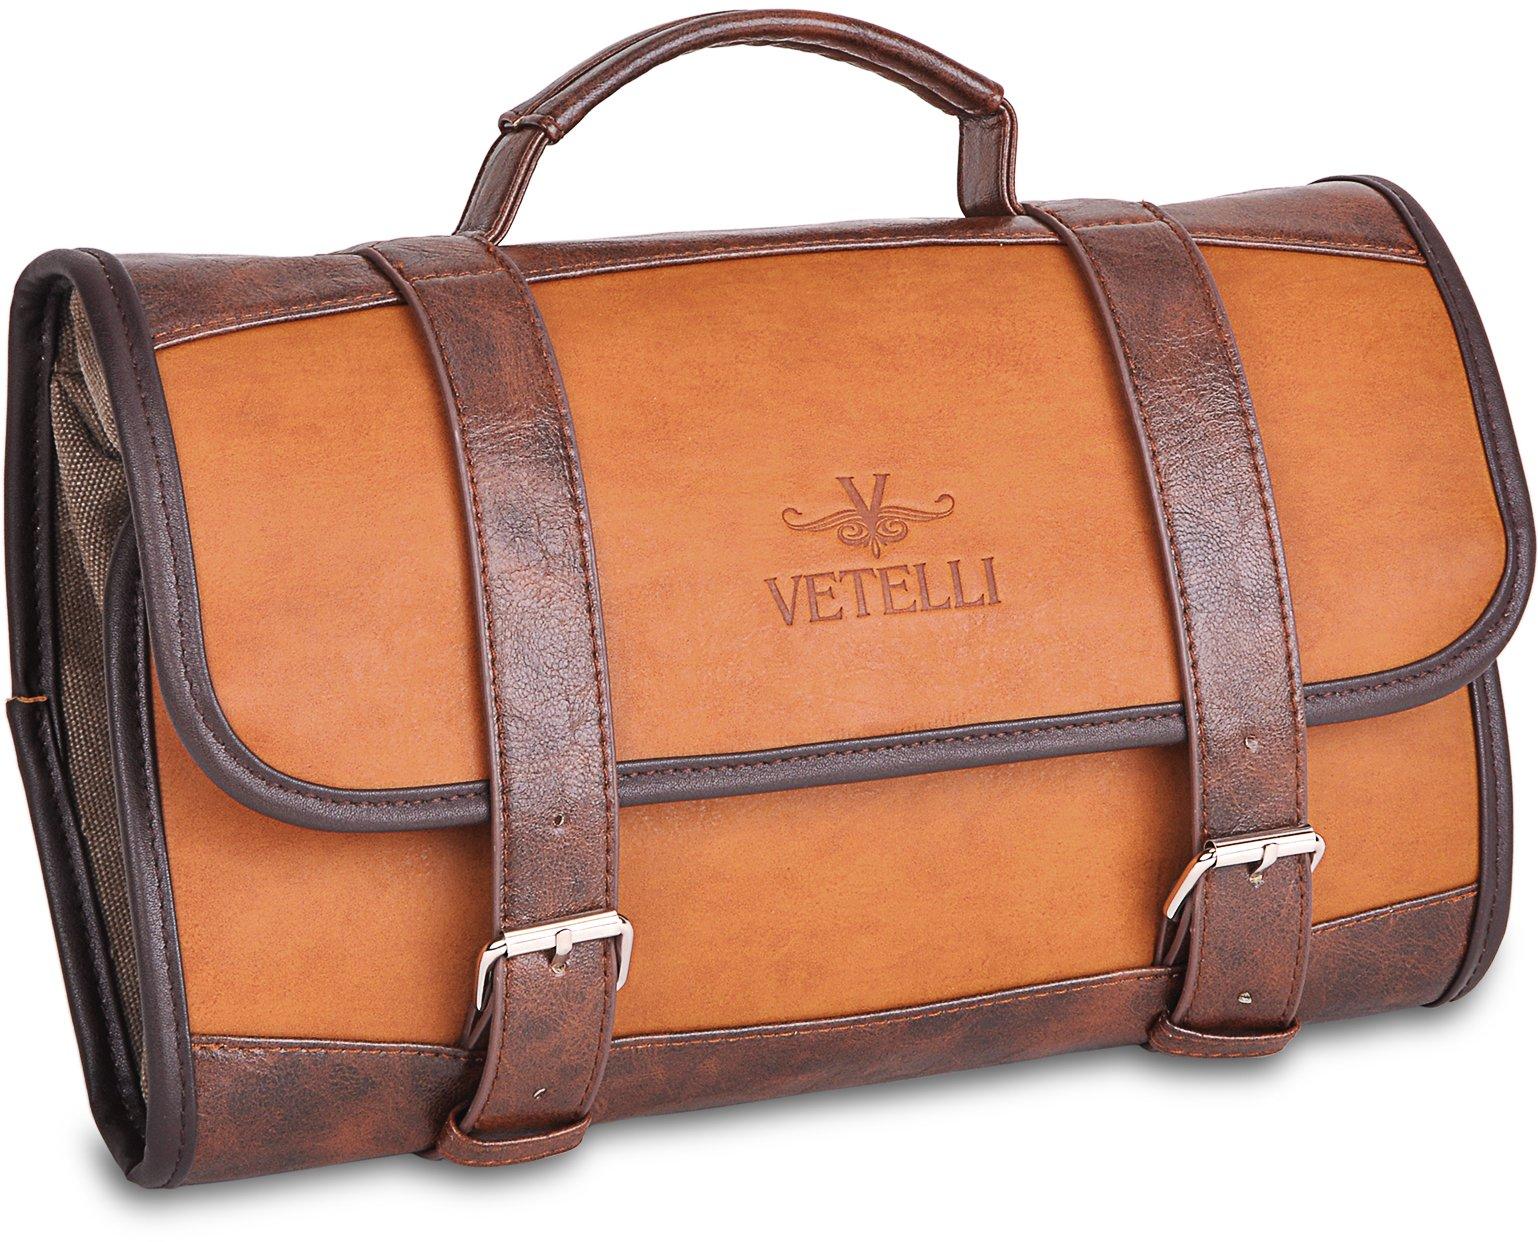 8c45babeaa Vetelli Hanging Toiletry Bag for Men - Dopp Kit Travel Accessories Bag Great  Gift